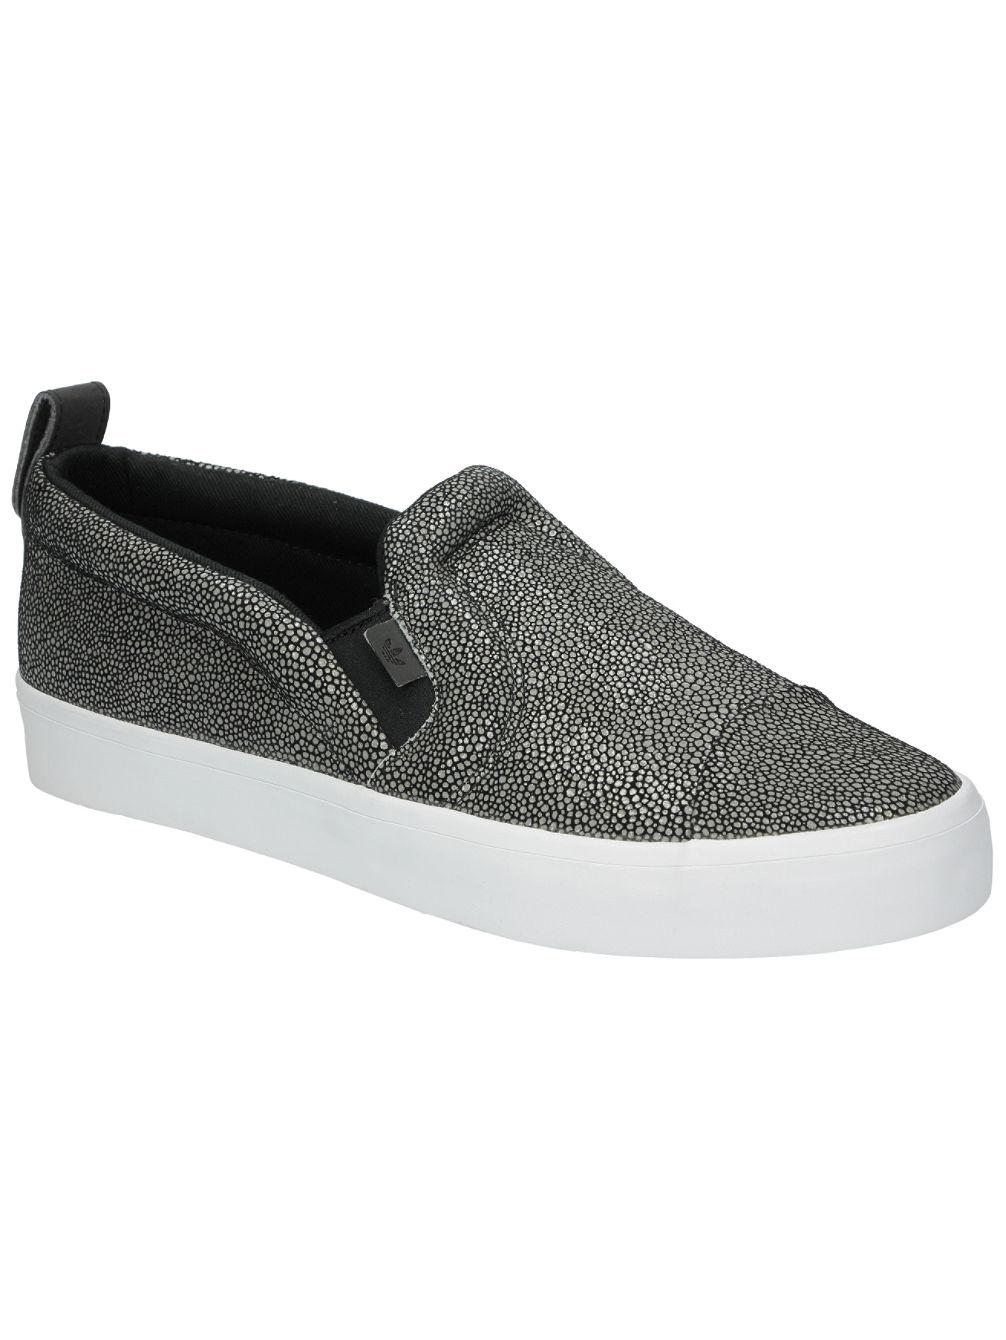 adidas-originals-honey-20-slippers-women